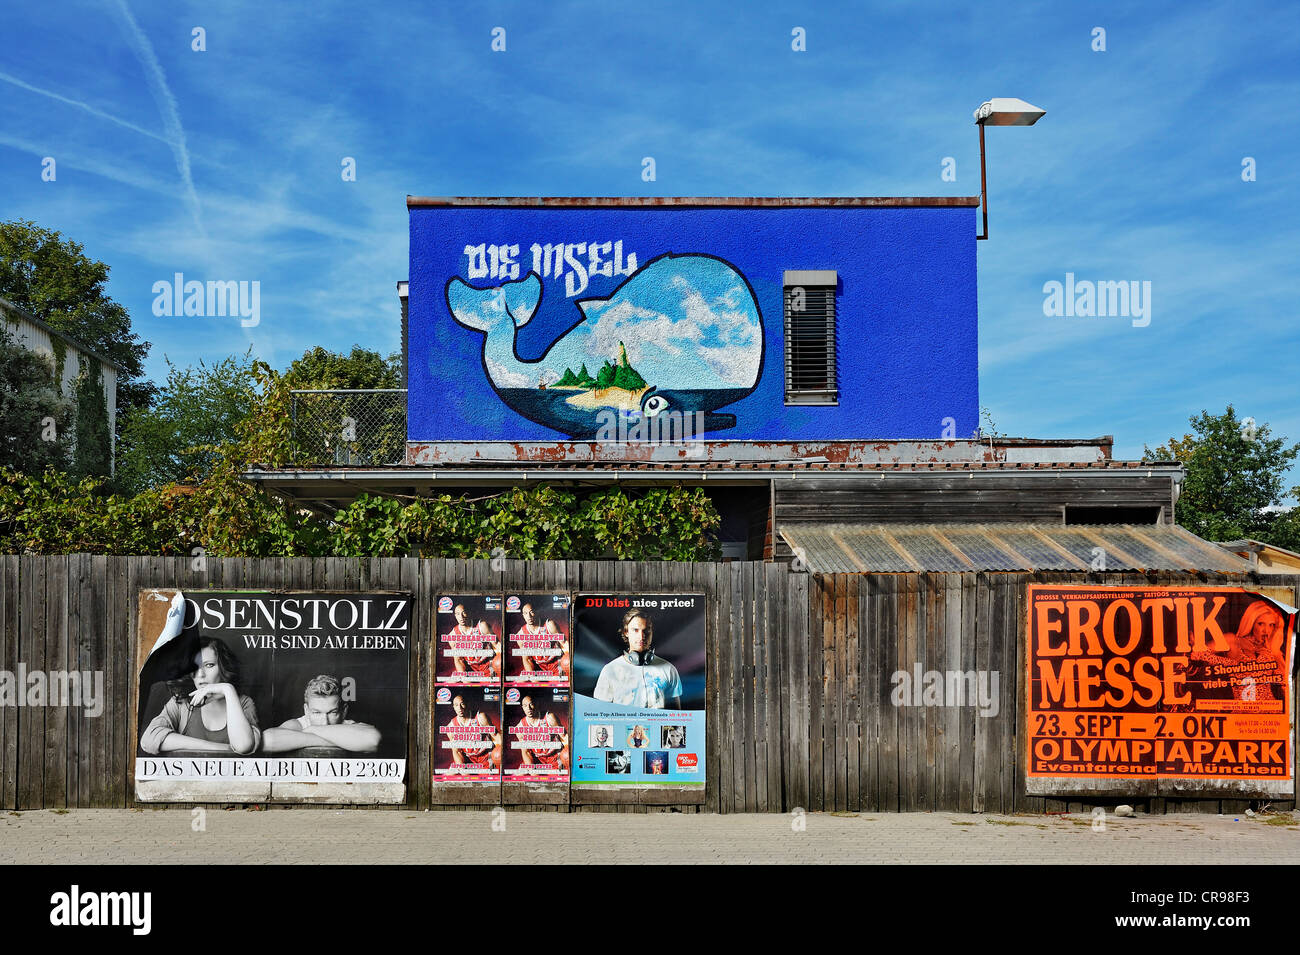 Die Insel, a club in the Kultfabrik complex, Berg am Laim, Munich, Bavaria, Germany, Europe - Stock Image